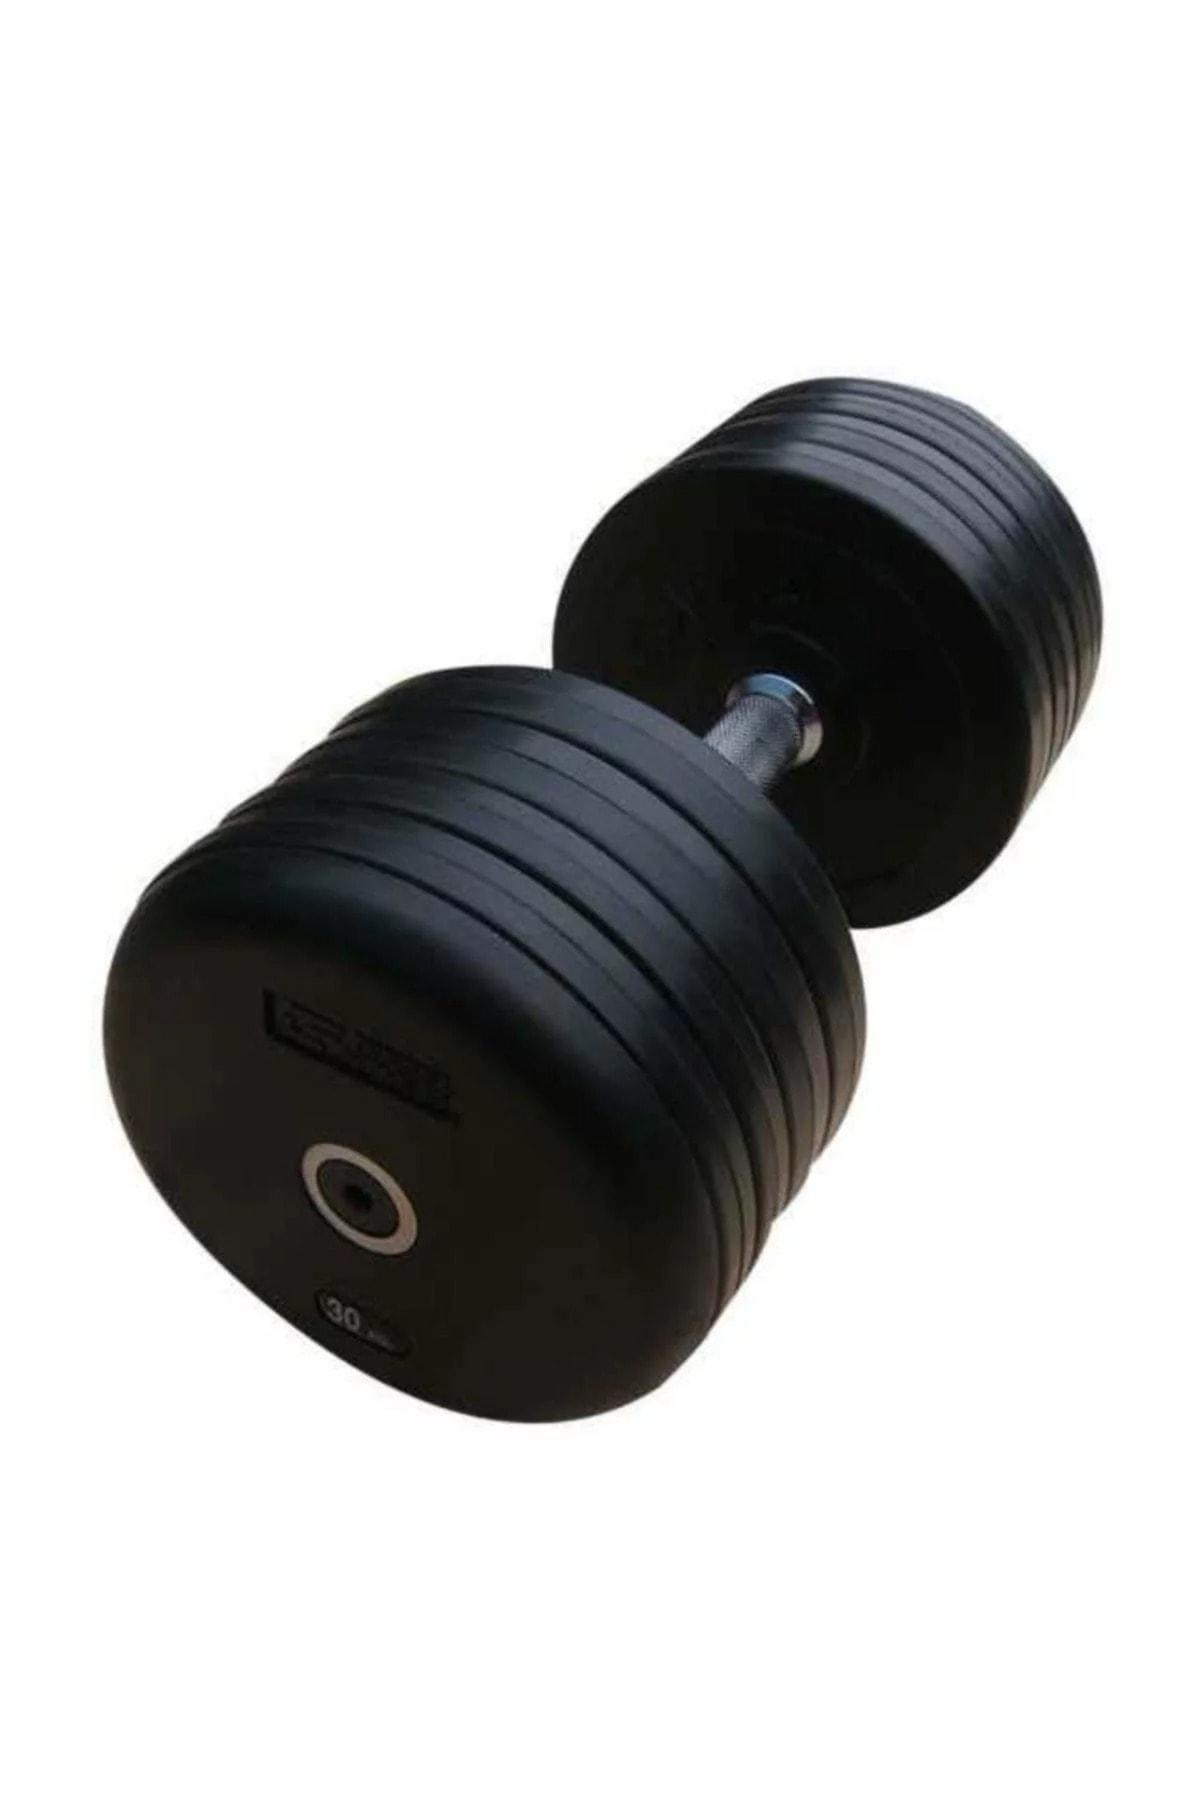 Diesel Fitness PSD-5 Kauçuk Dambıl 30 kg. 1